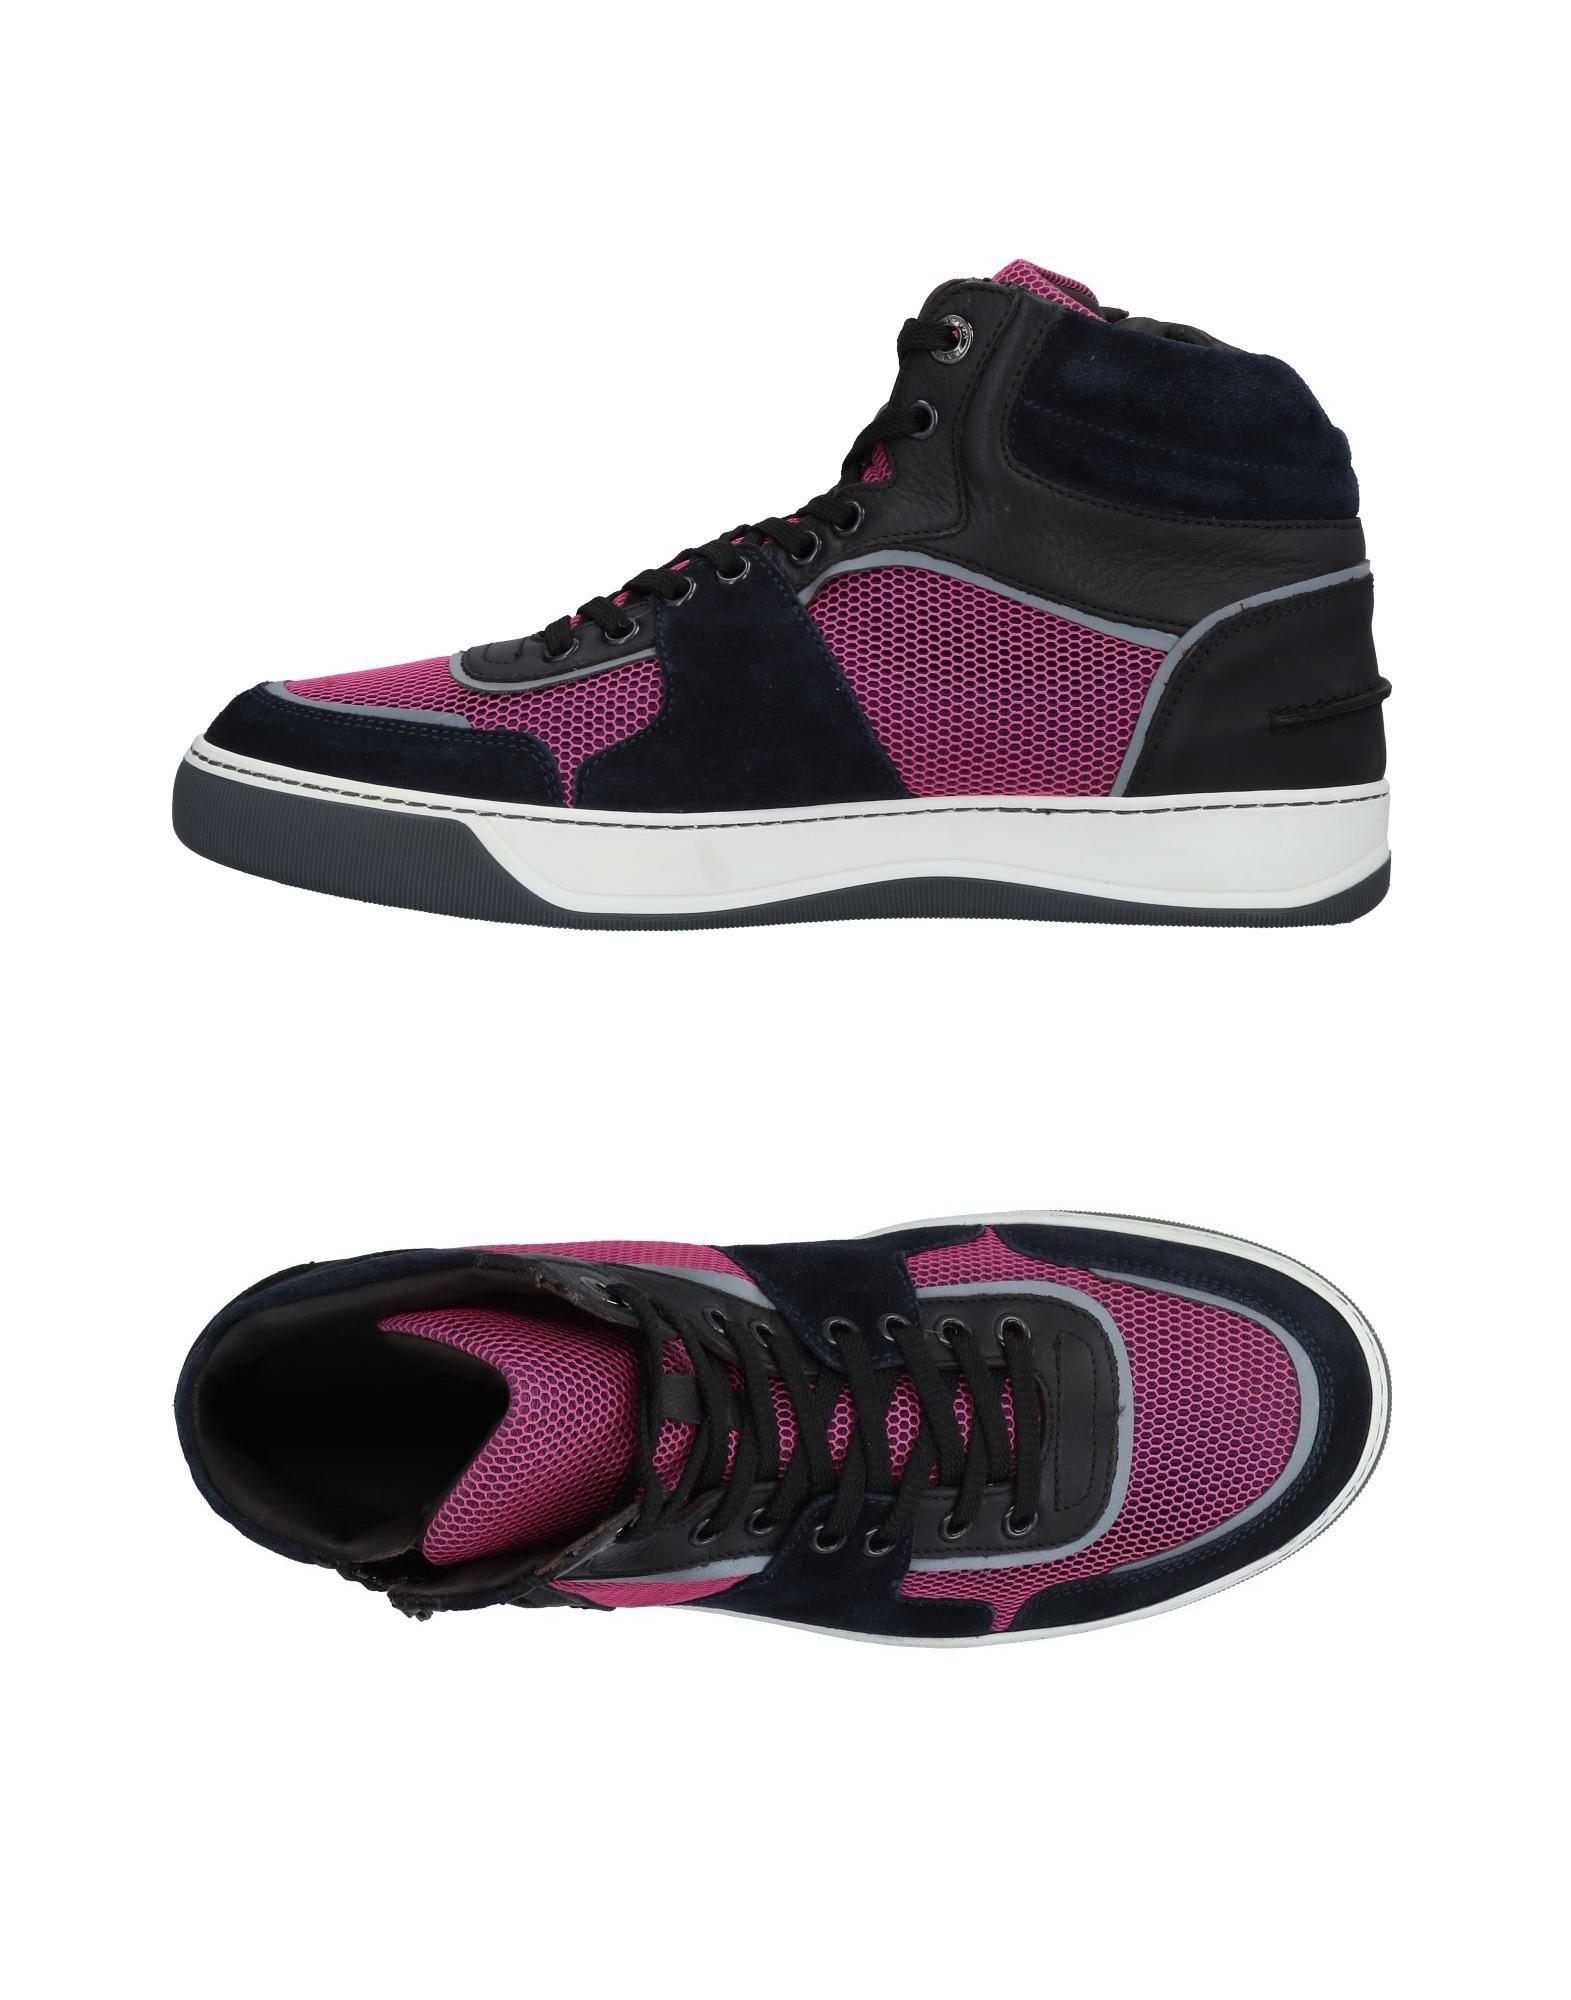 Moda Sneakers Lanvin Uomo - 11480005FP